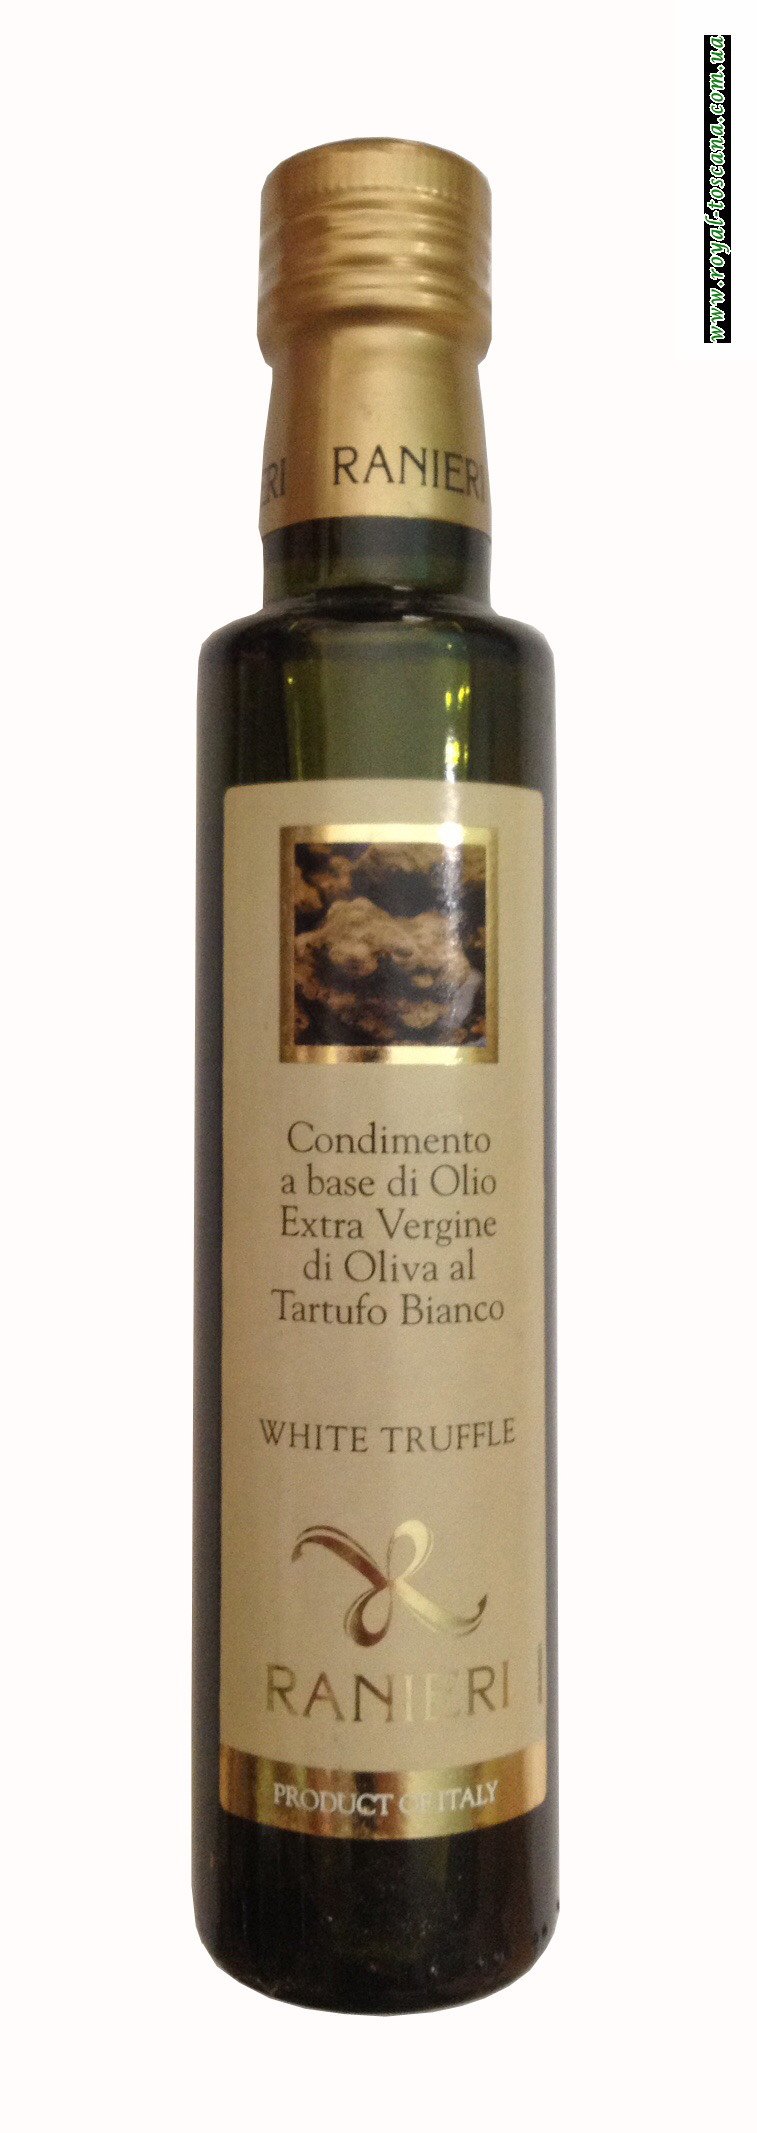 Оливковое масло с ароматом белого трюфеля Ranieri Condimento a Base di Olio Extra Vergine di Oliva al Tartufo Bianco